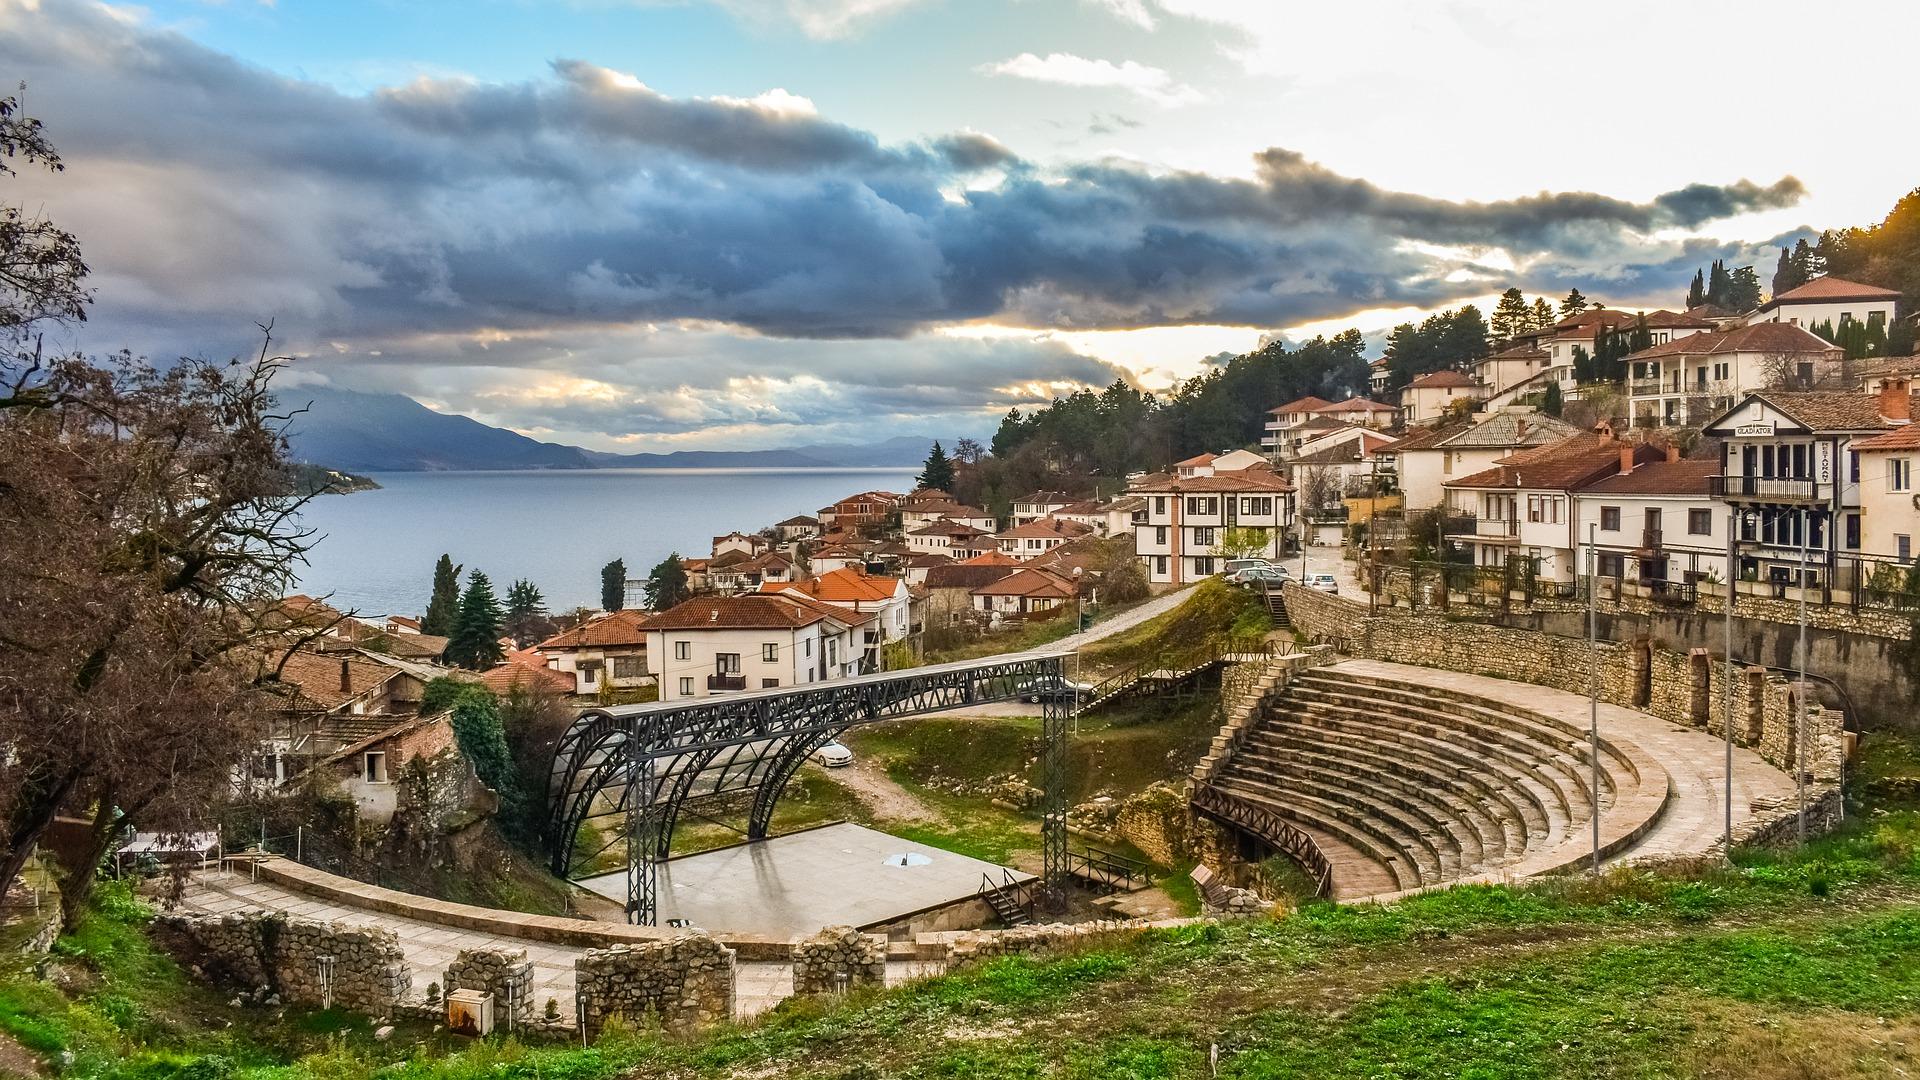 Ohrid in North Macedonia